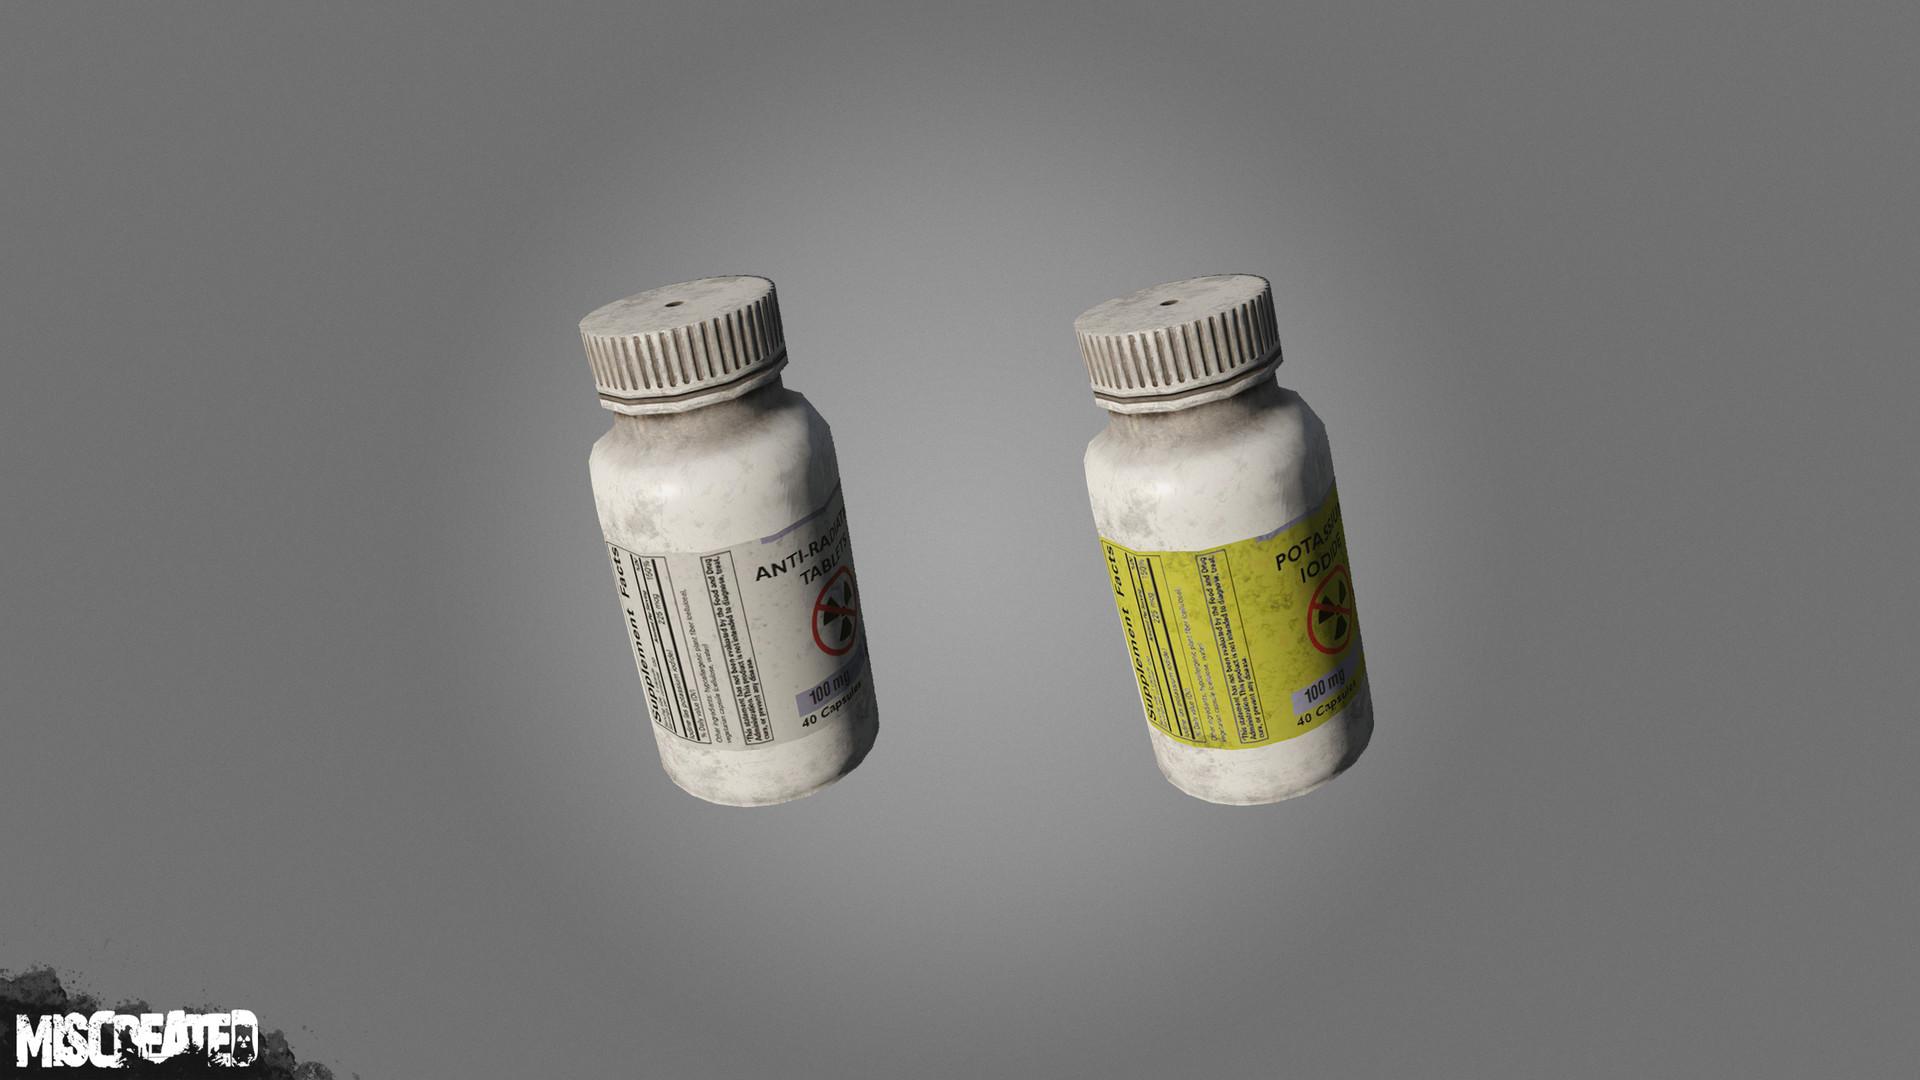 Carl kent pills 2